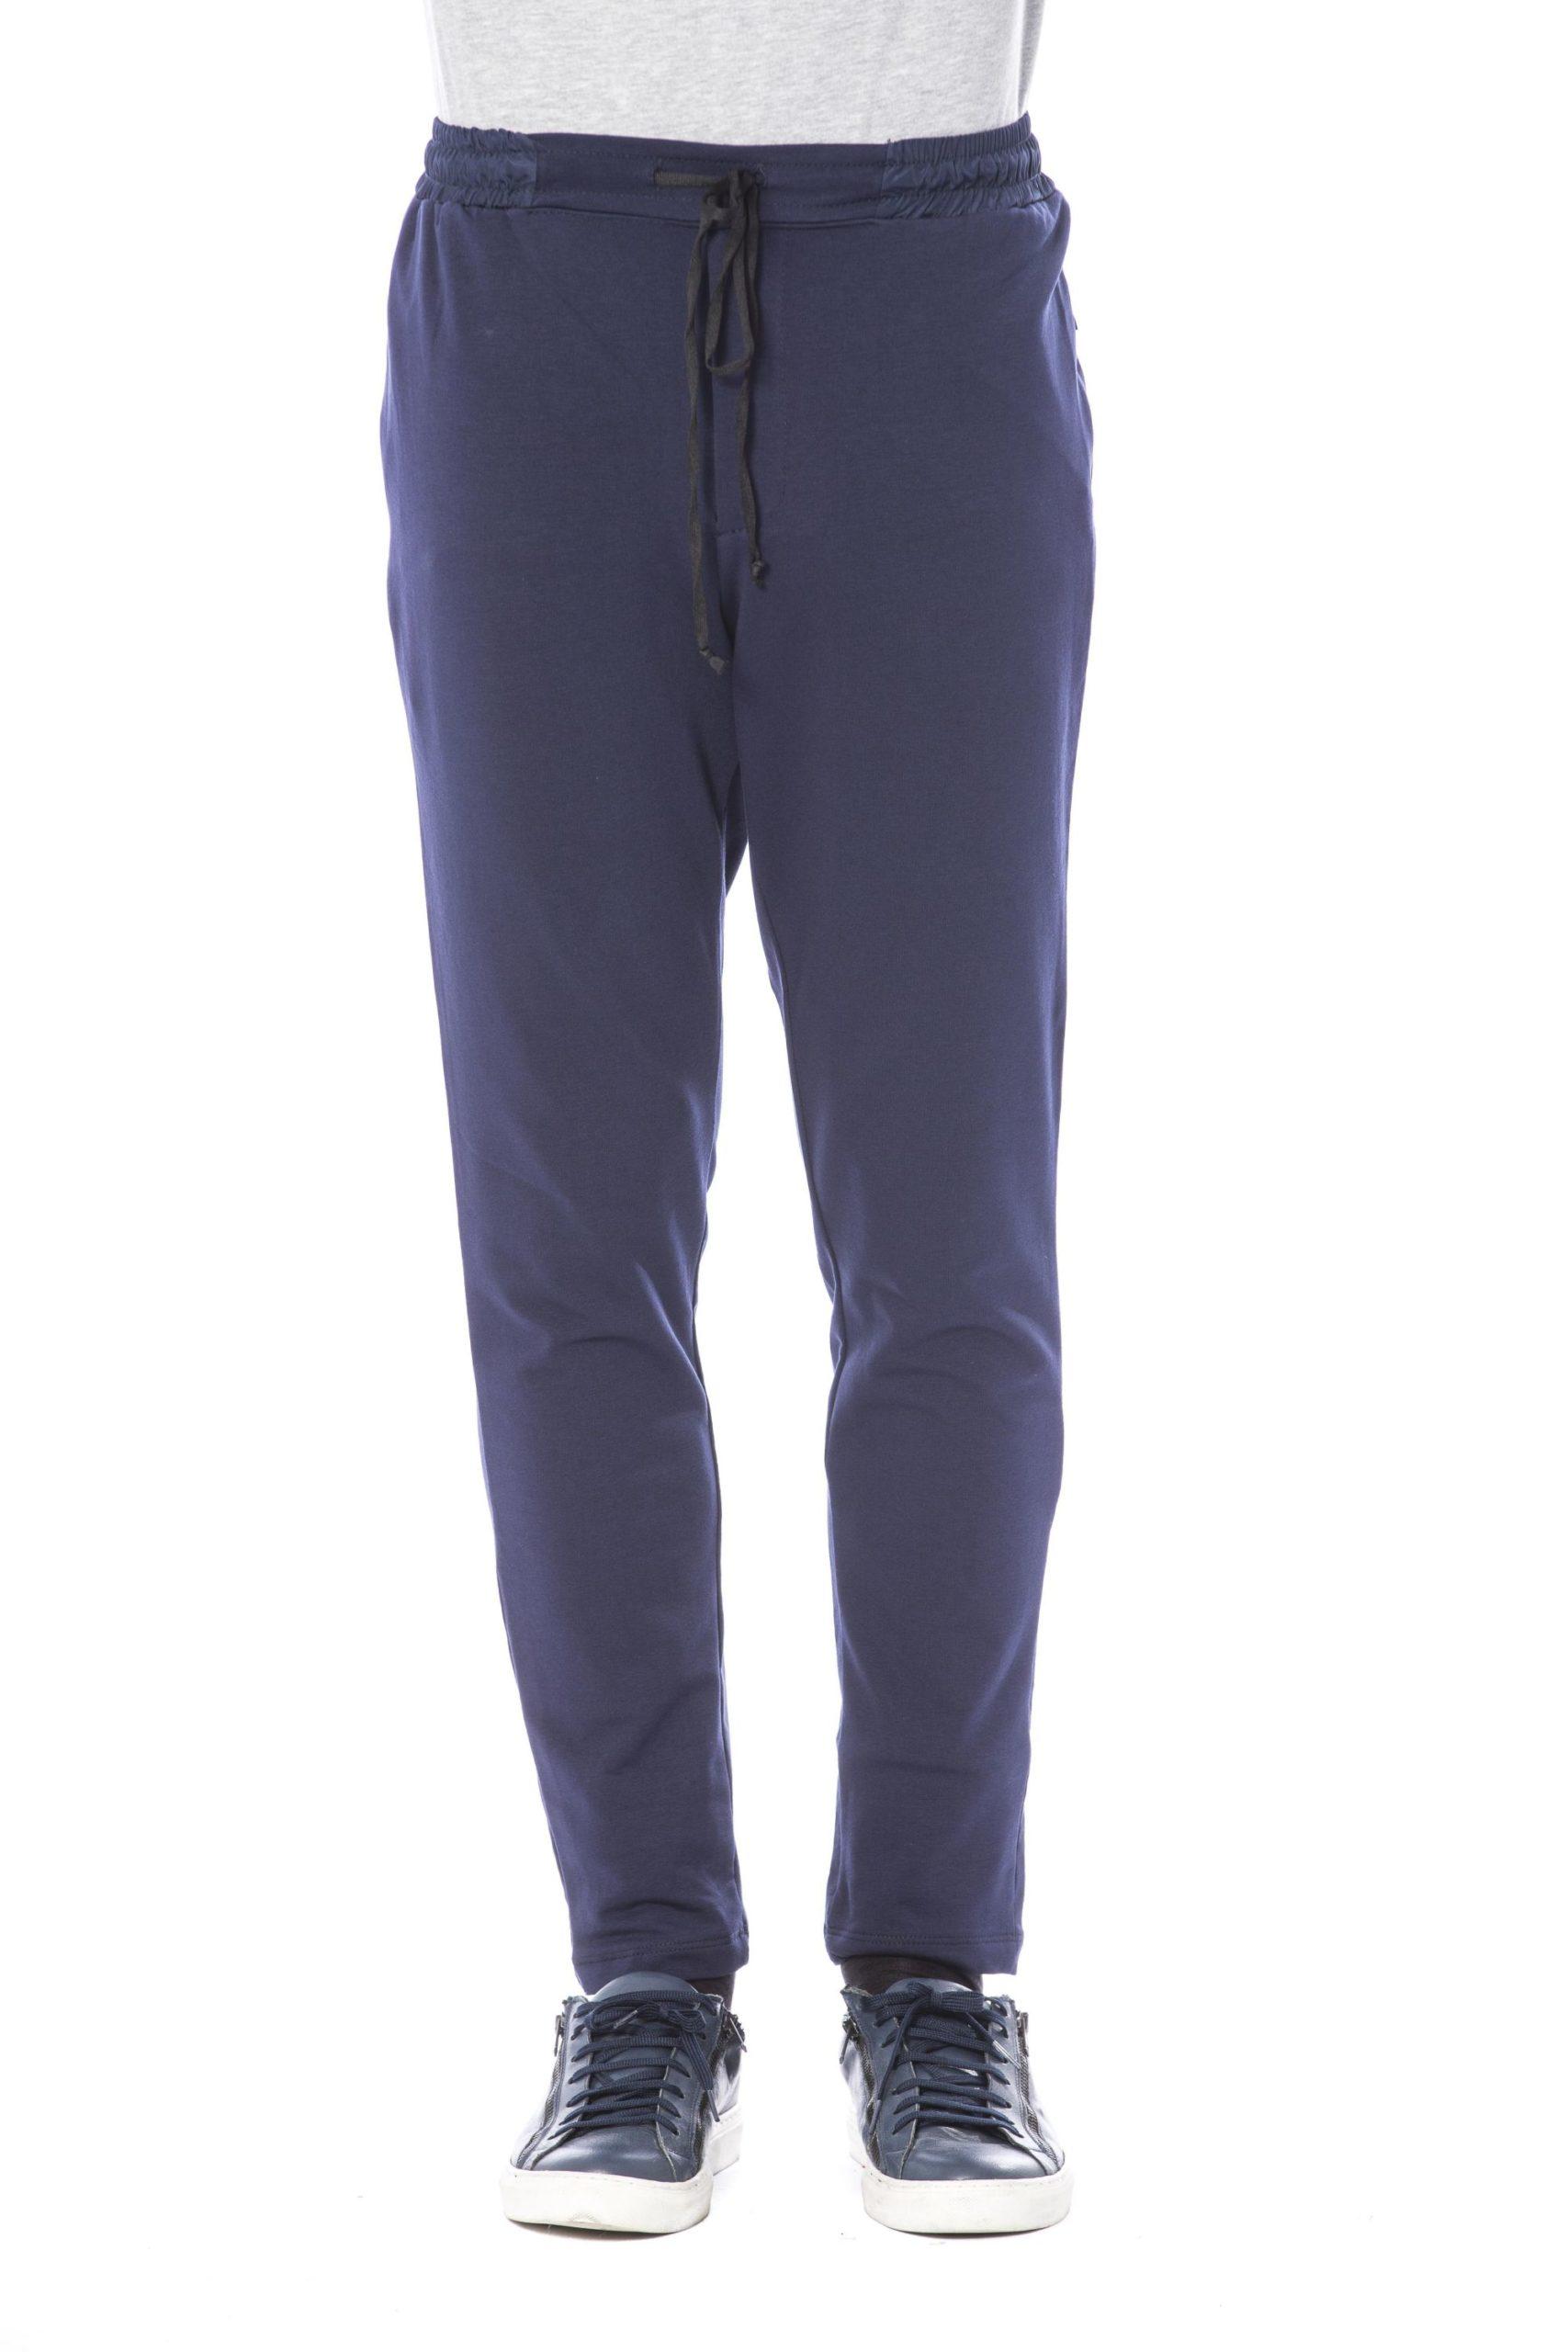 Verri Men's Trouser Blue VE1394866 - XL